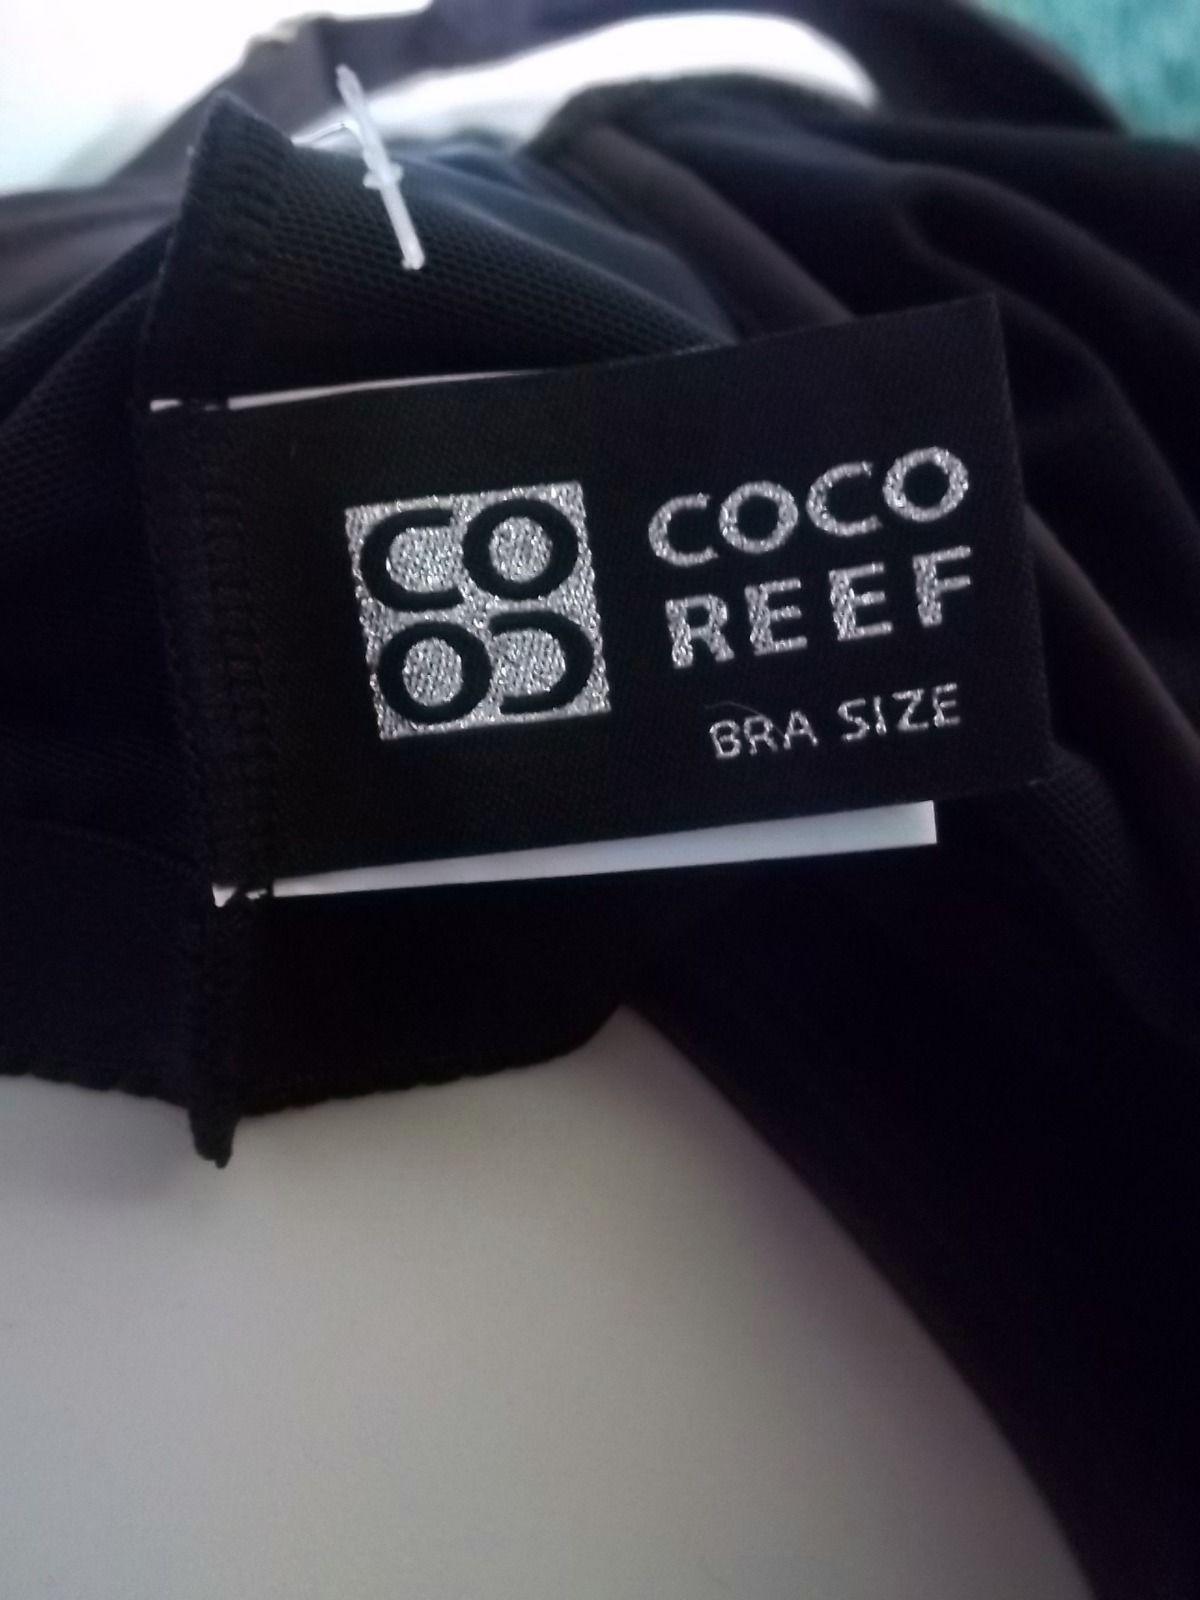 COCO REEF COFFEE BEAN TANKINI AND CLASSIC BOTTOM, SIZE MEDIUM/32C